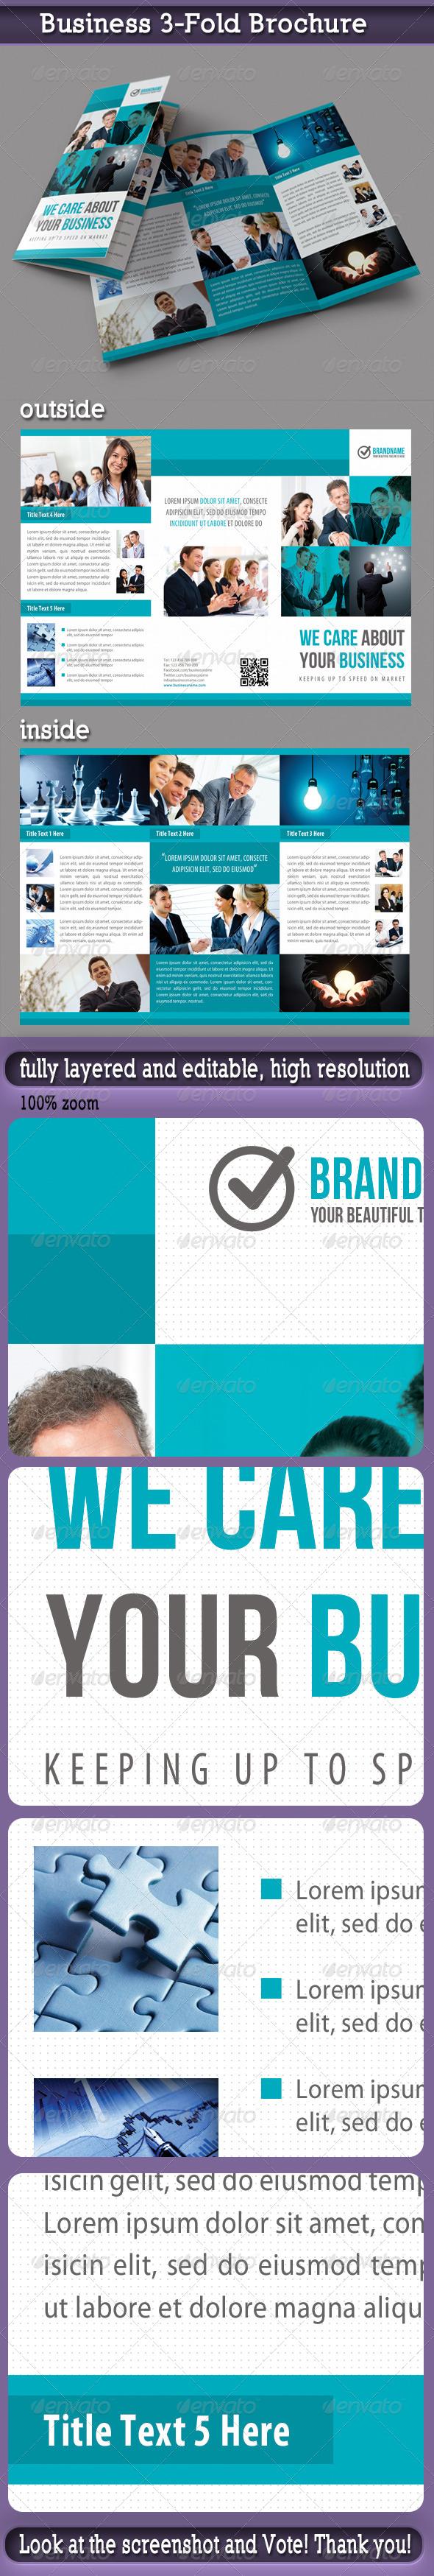 Business 3-Fold Brochure - Corporate Brochures